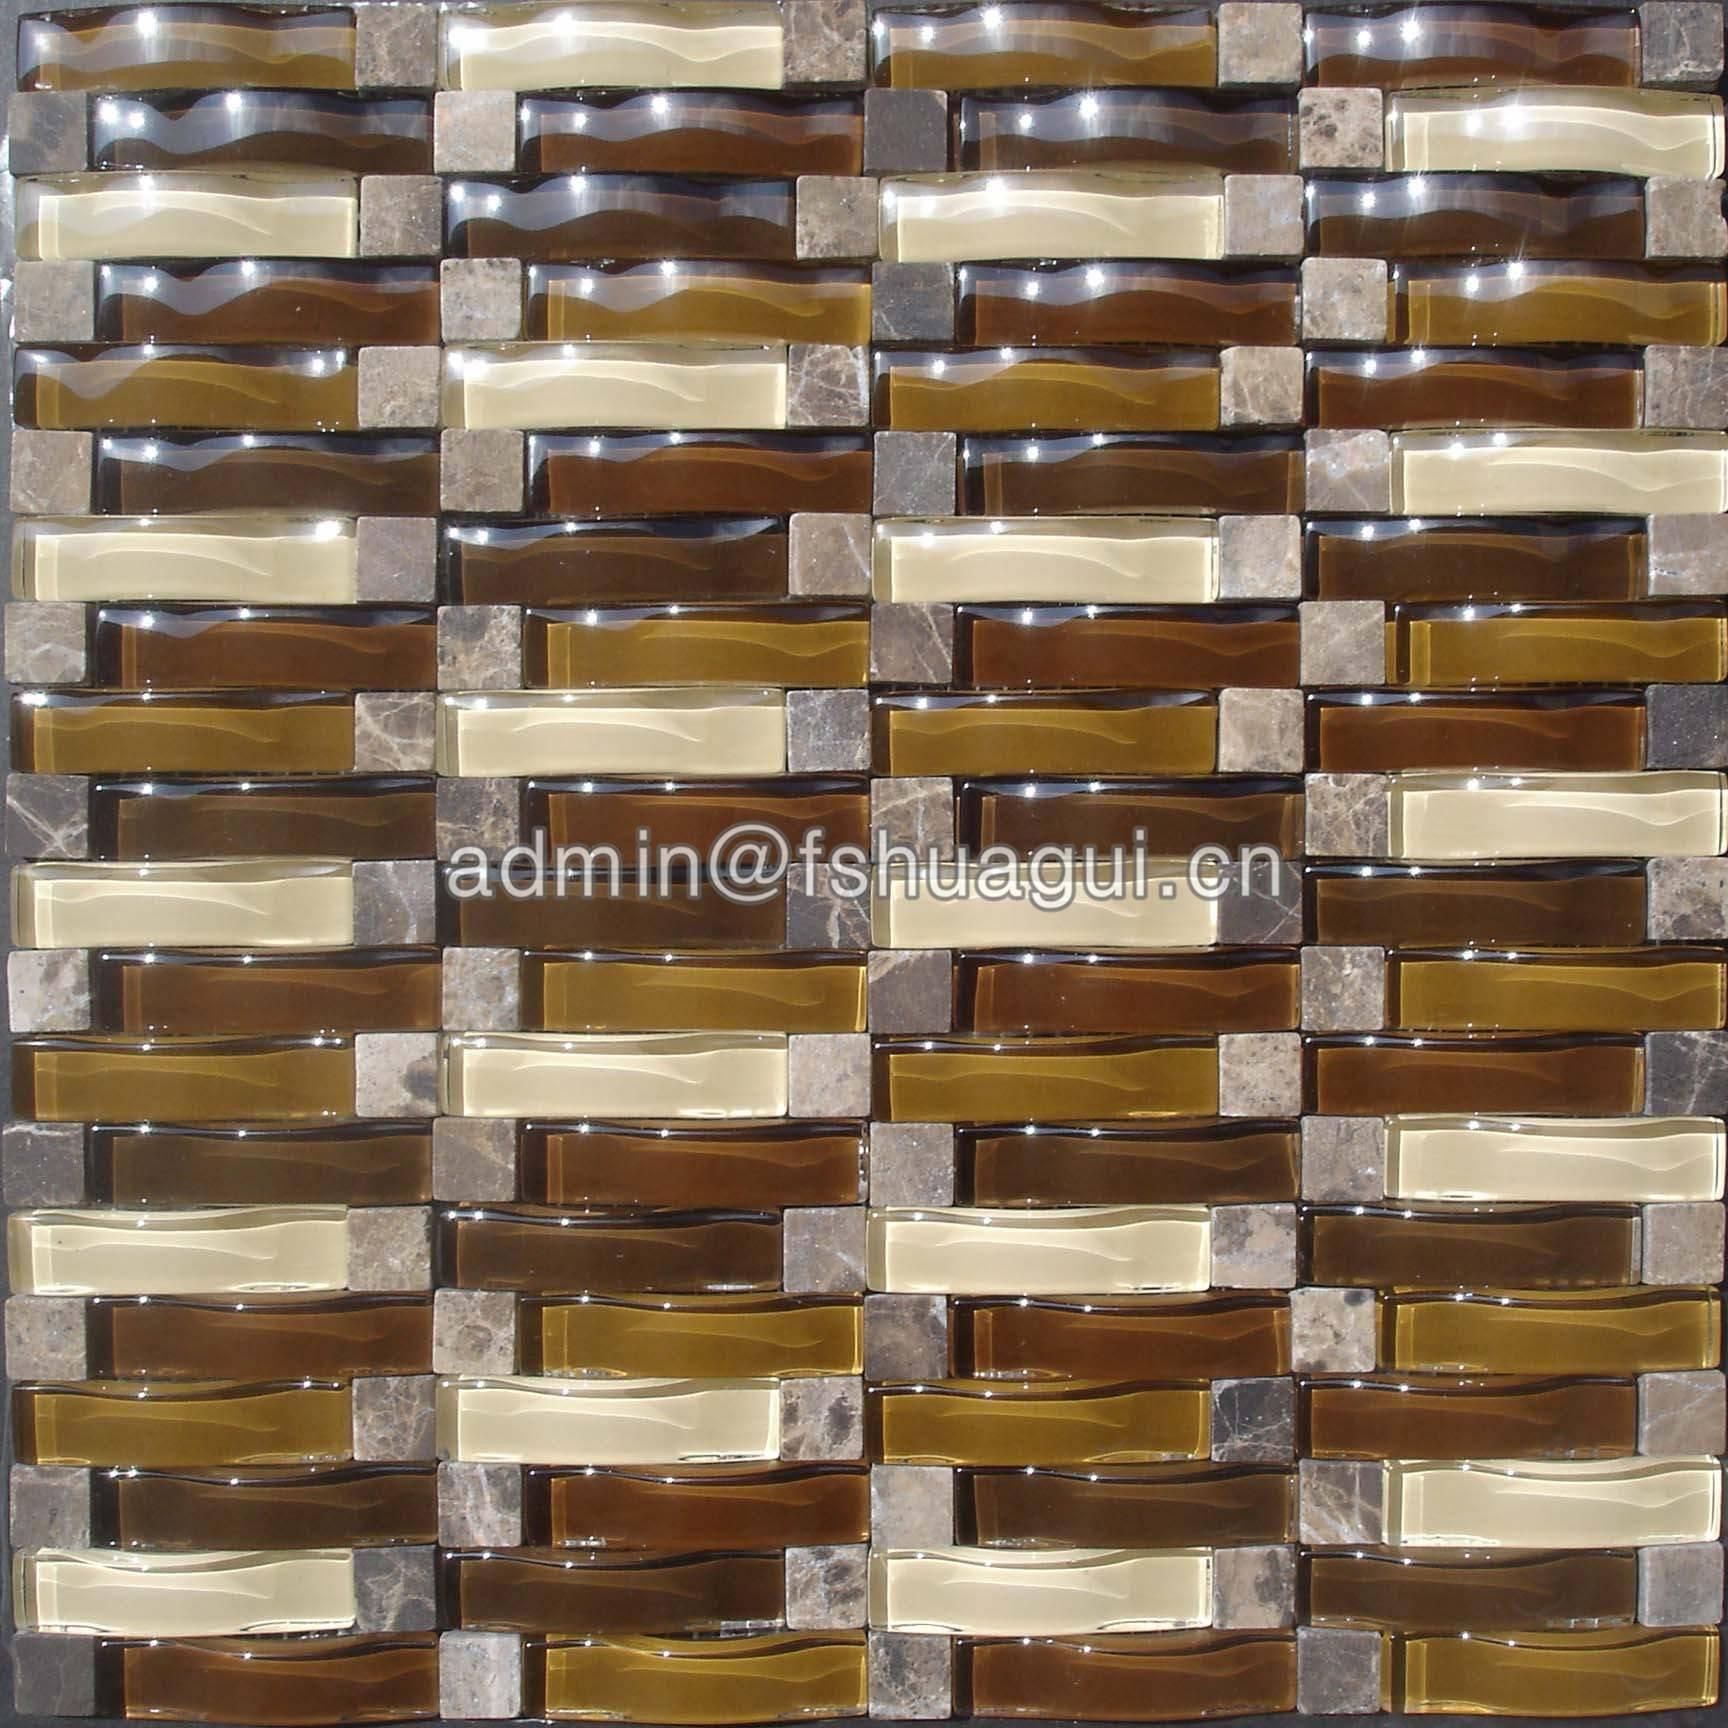 Huagui Glass mosaic tile HG-84006 GLASS MOSAIC TILE image61